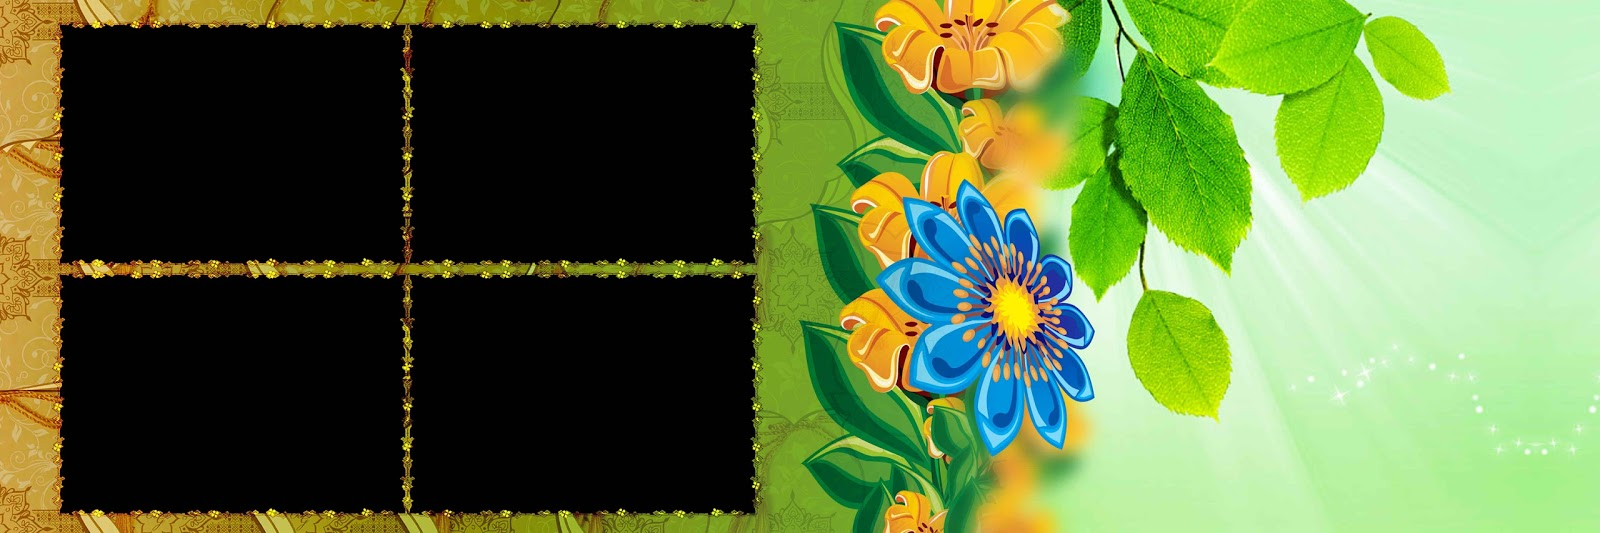 Images of X Album Background - #rock-cafe